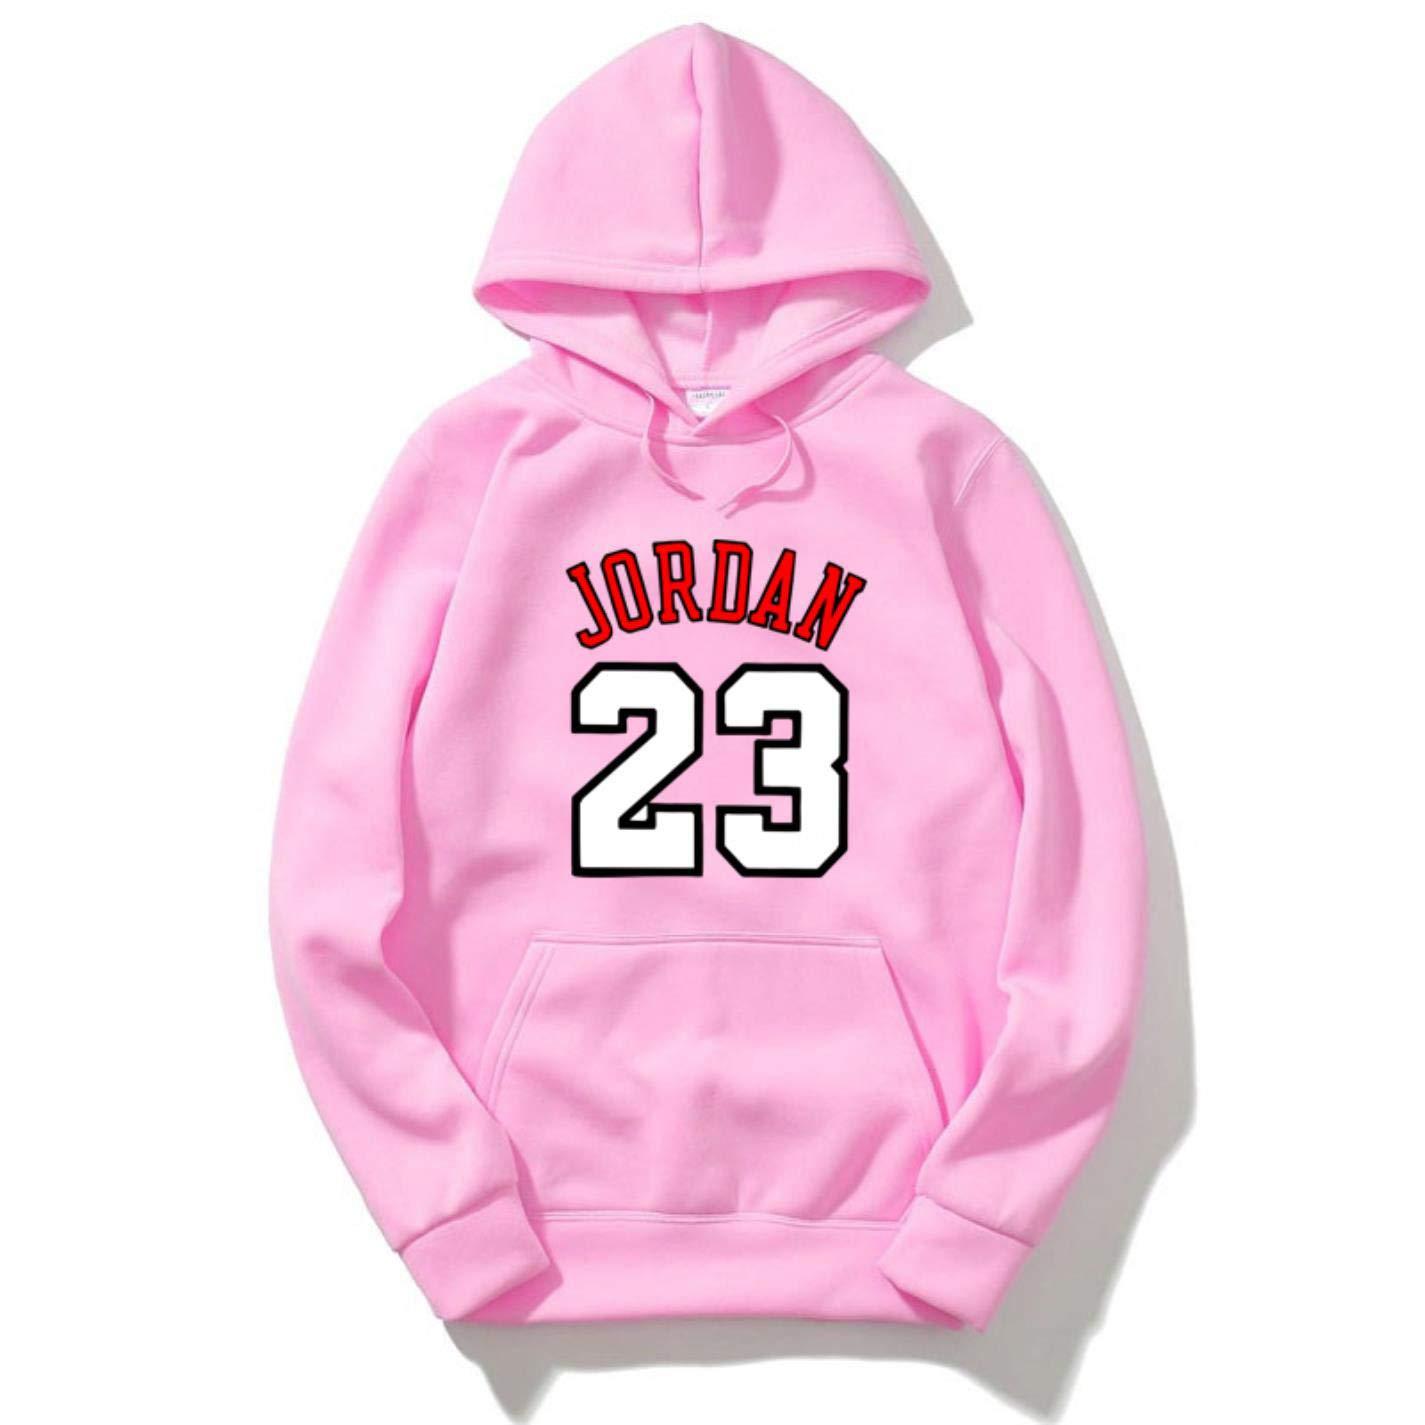 d7137f422bb6 Amazon.com  Bulls Jordan Hoodies Street wear Men Women Fashion Hoodie  Sweatshirt  Clothing